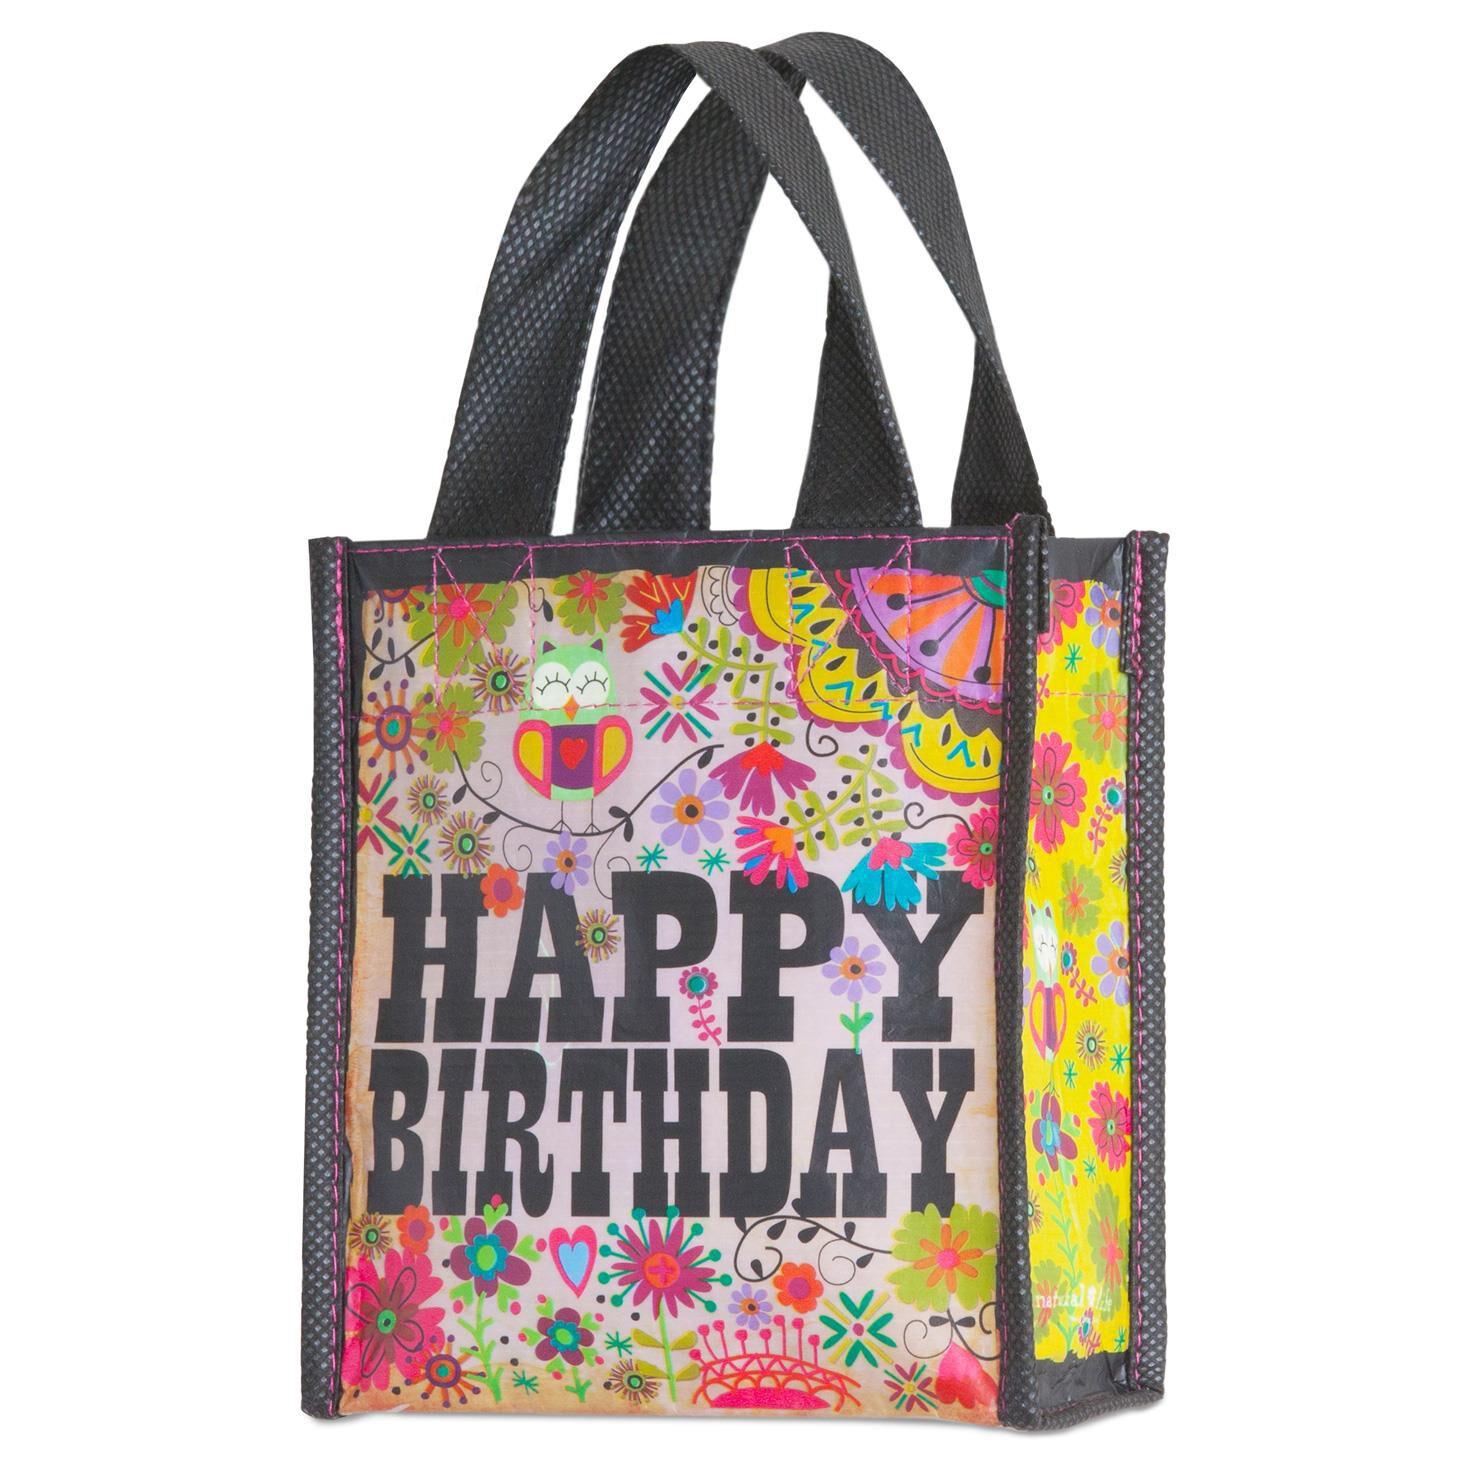 Natural Life Happy Birthday Gift Bag, Small - Bags & Purses - Hallmark